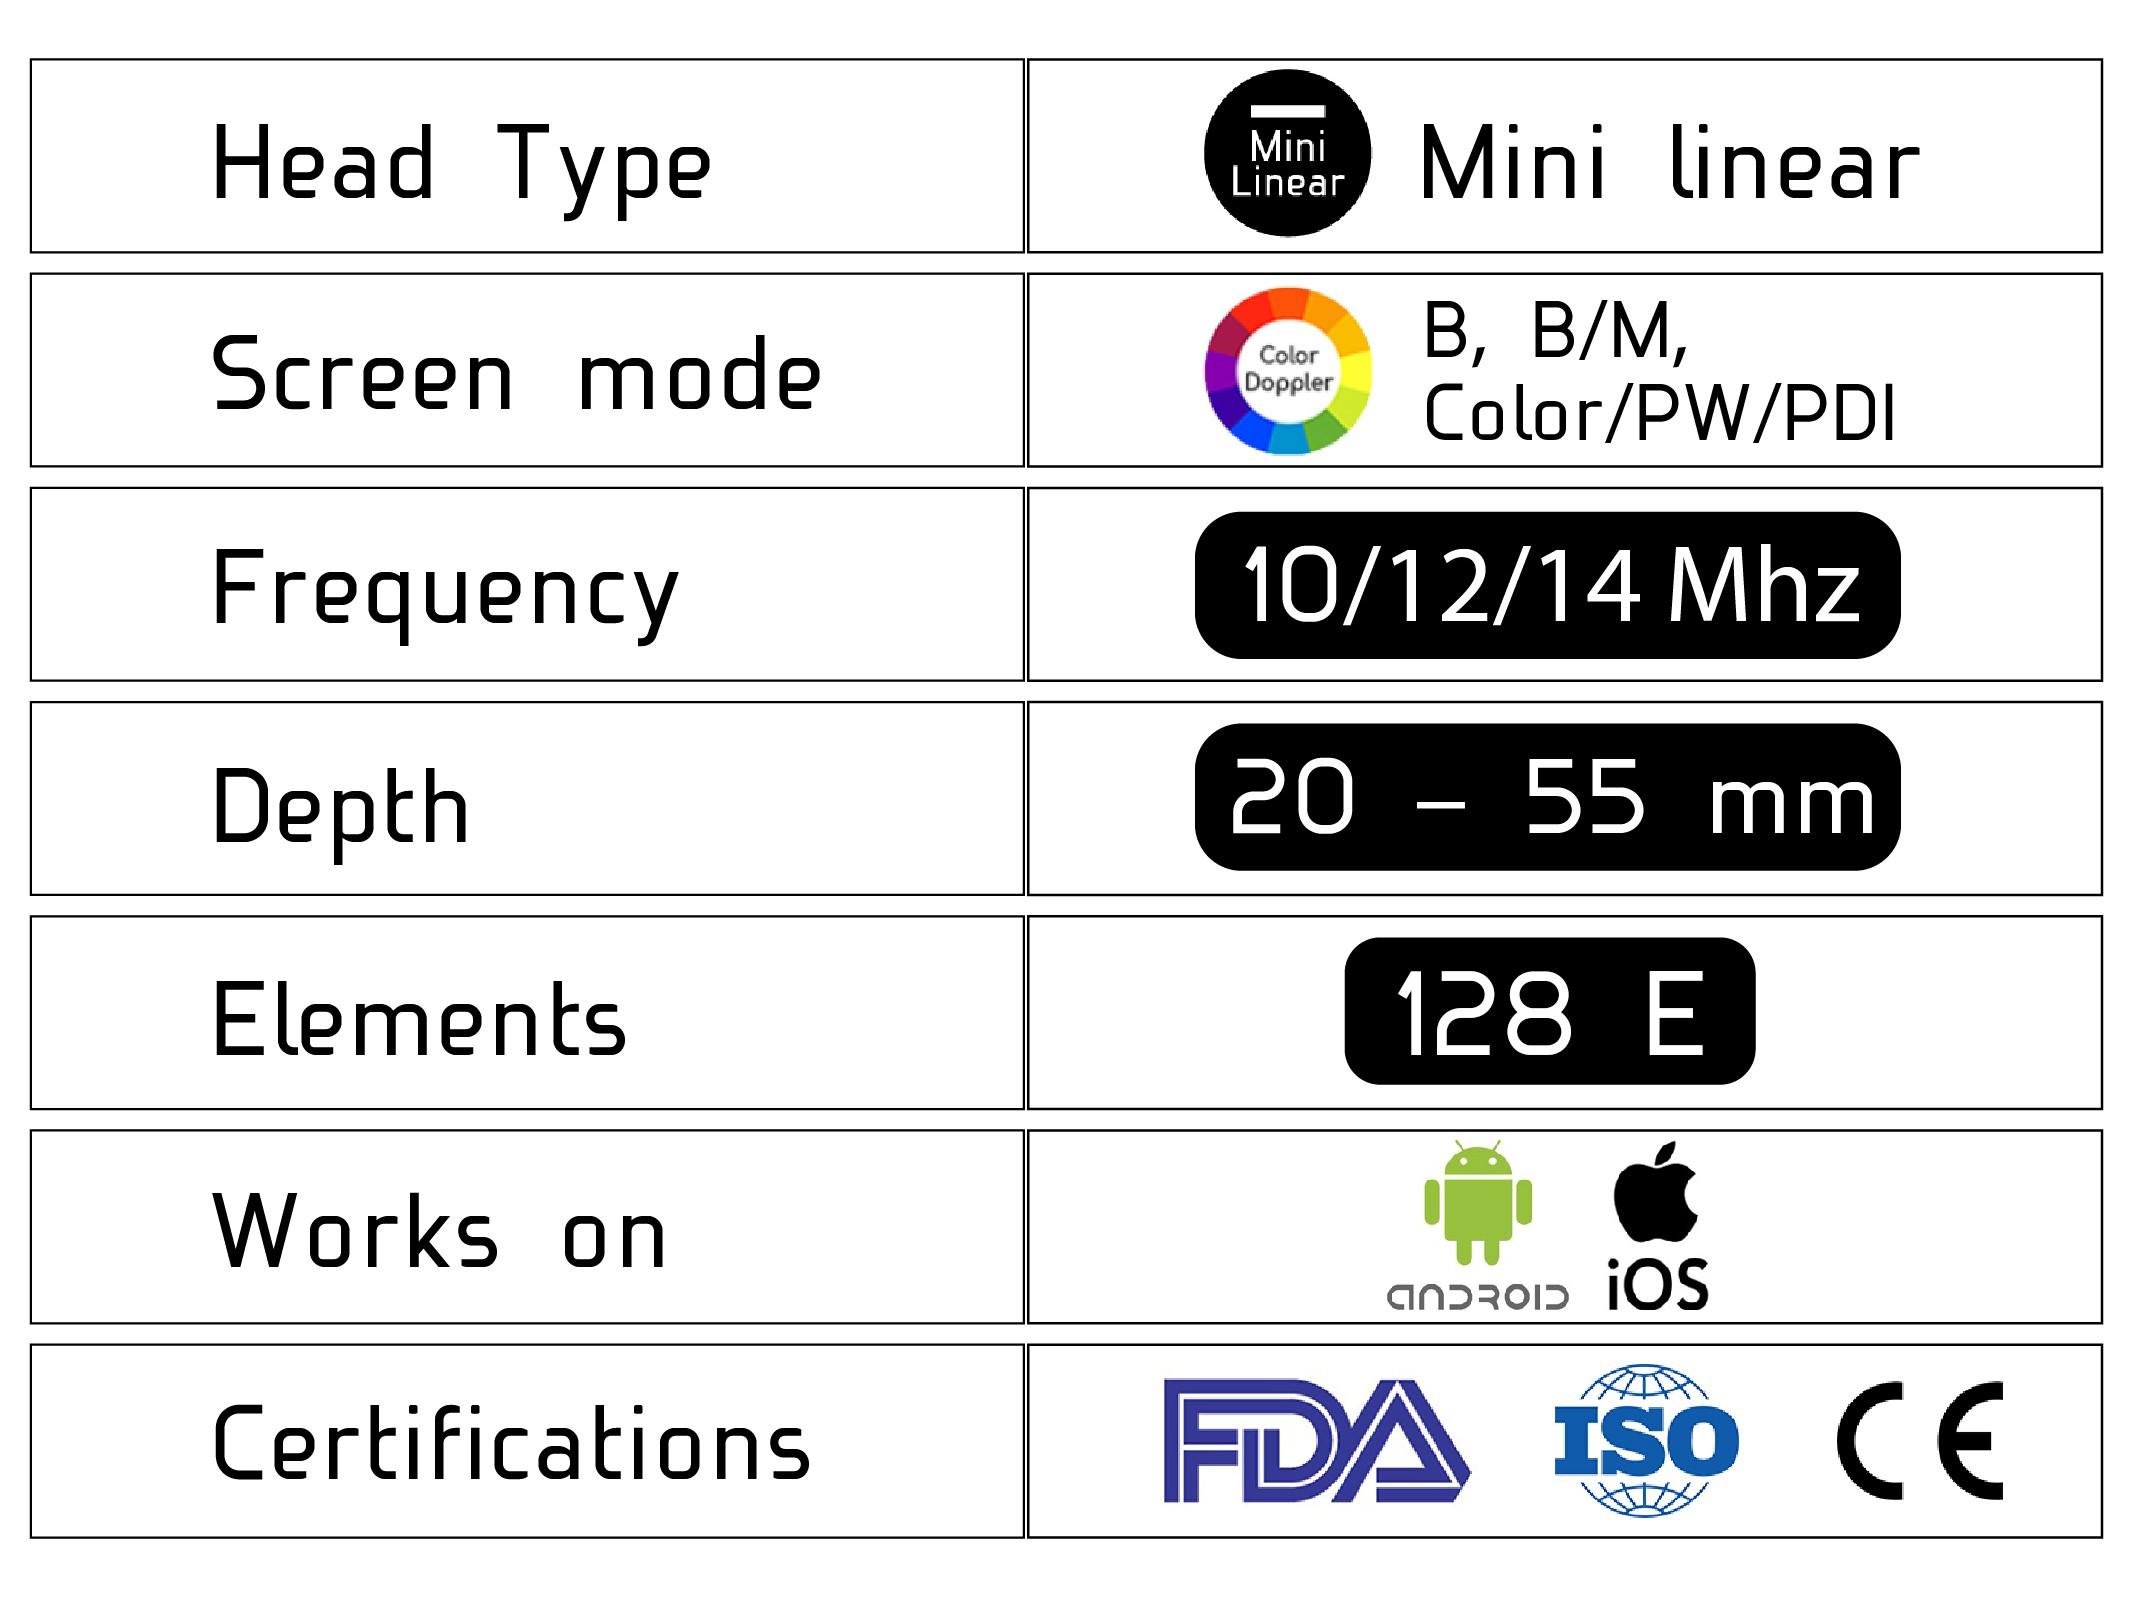 Escàner d'ultrasò WiFi de mà